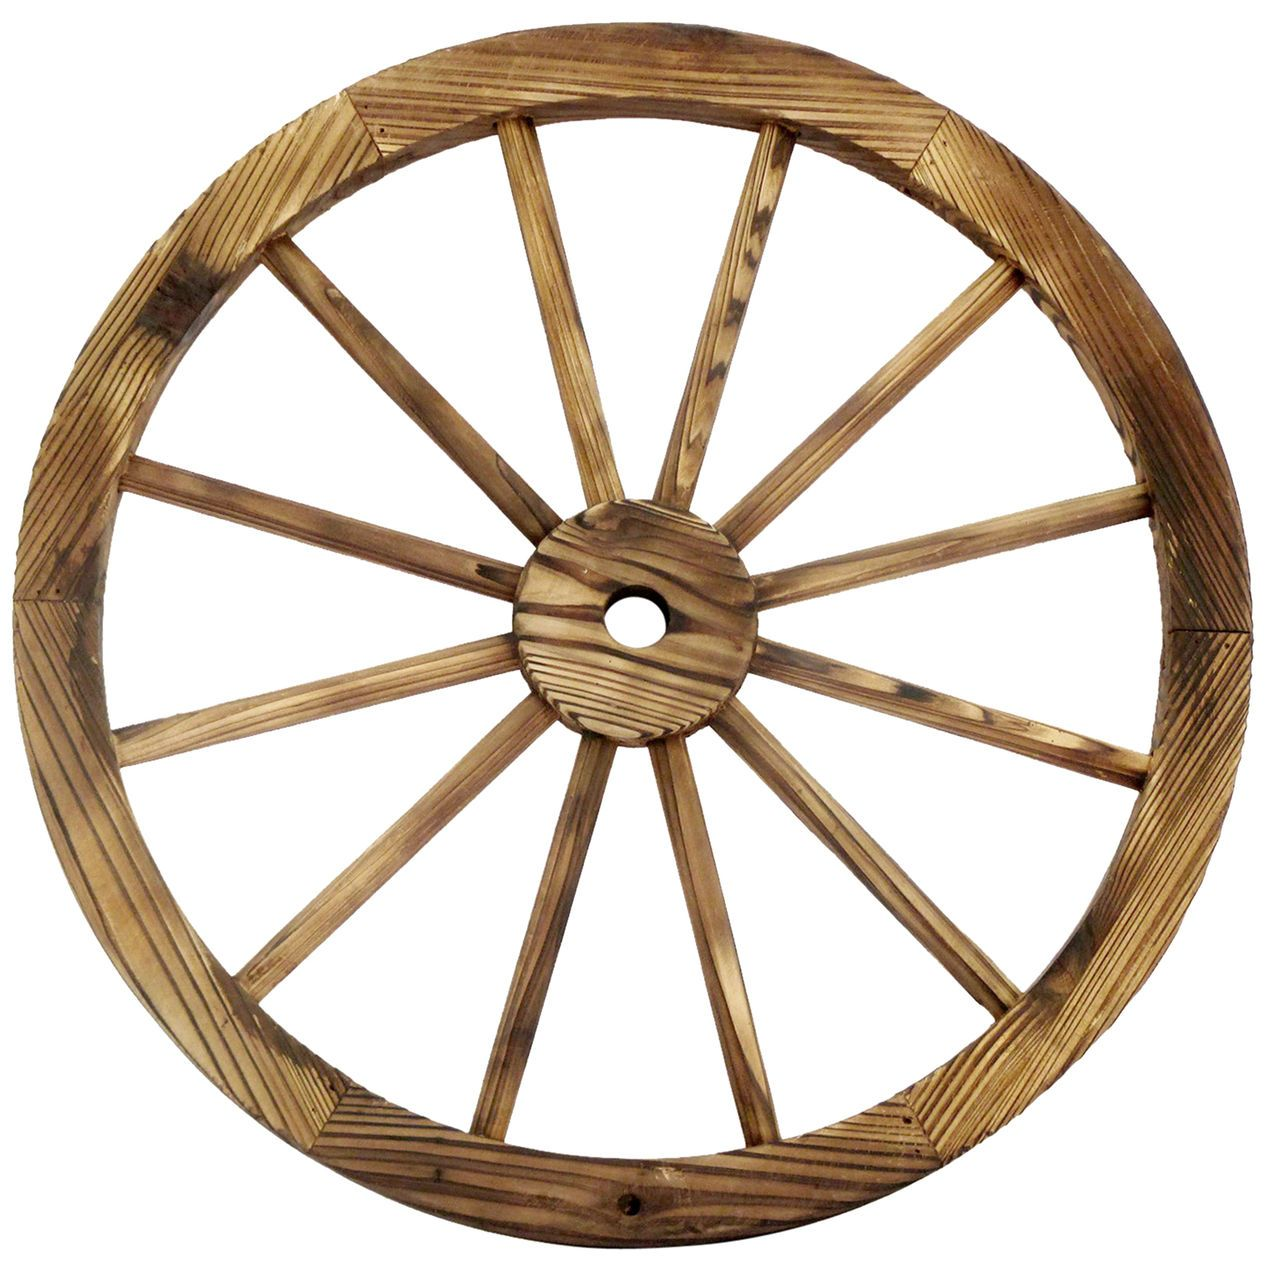 Decorating Ideas With Wagon Wheels | 24 In. Wood Wagon Wheel Patio Décor